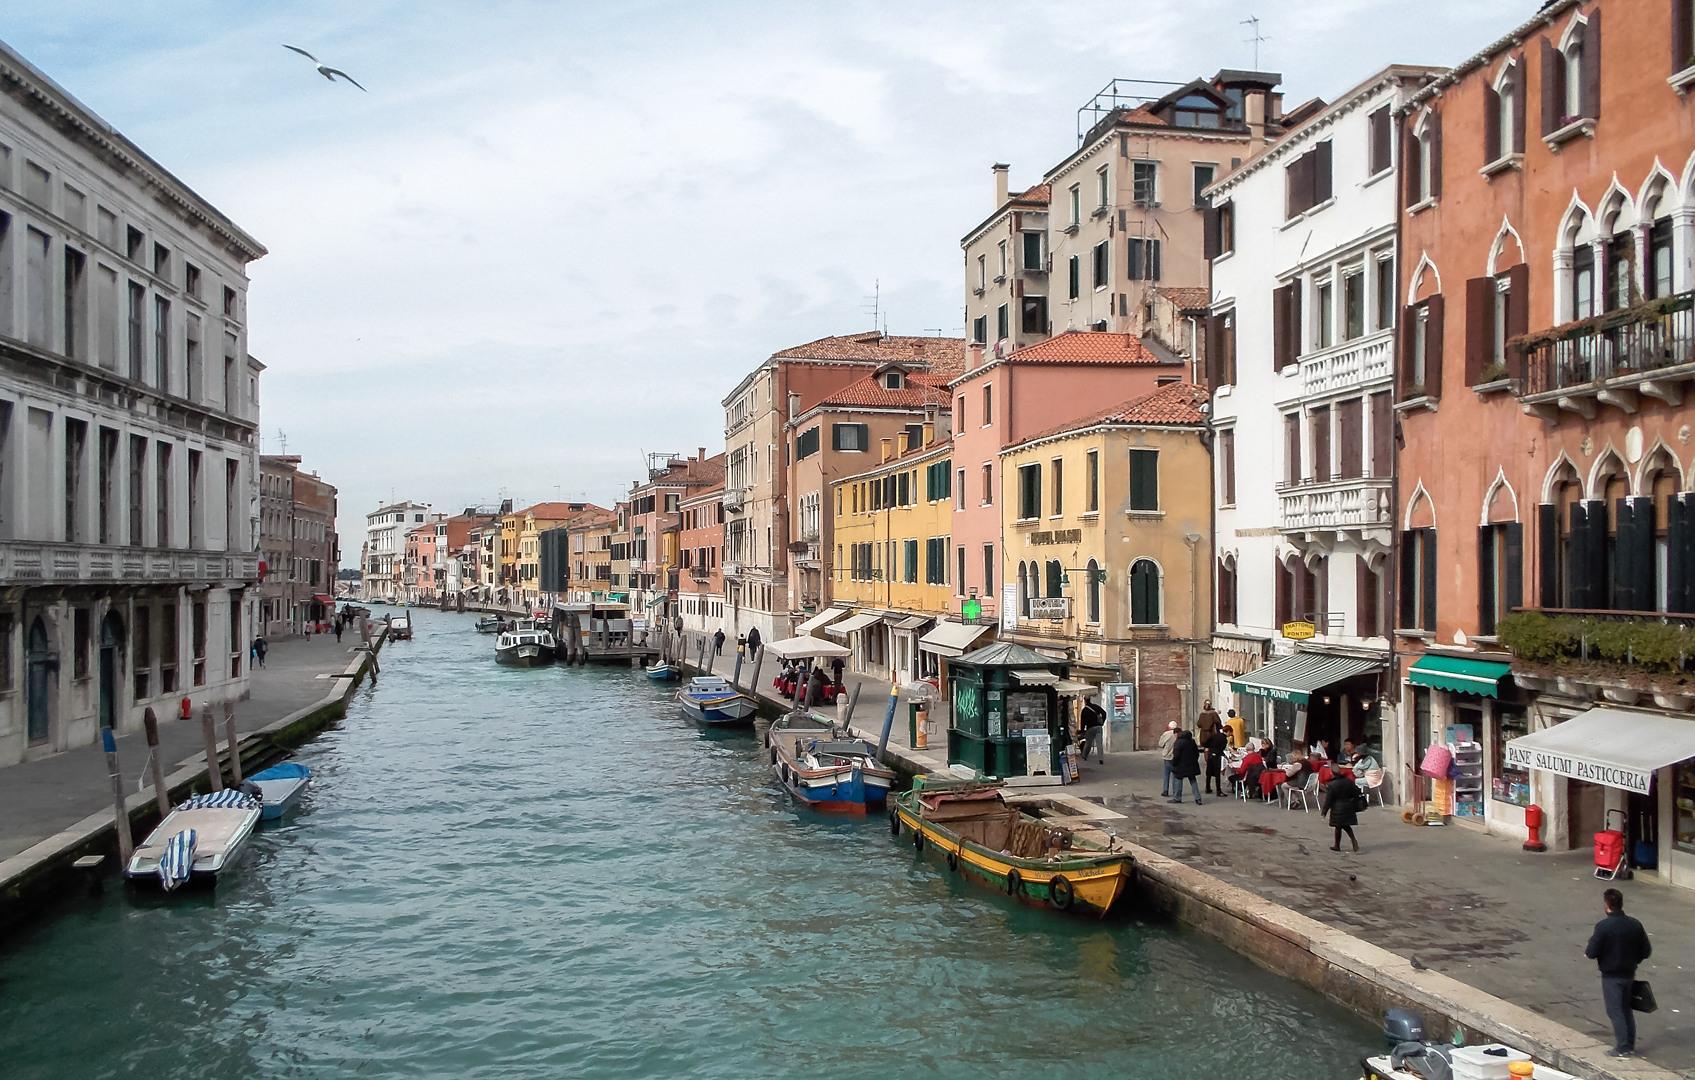 Каналы, Венеция, Италия